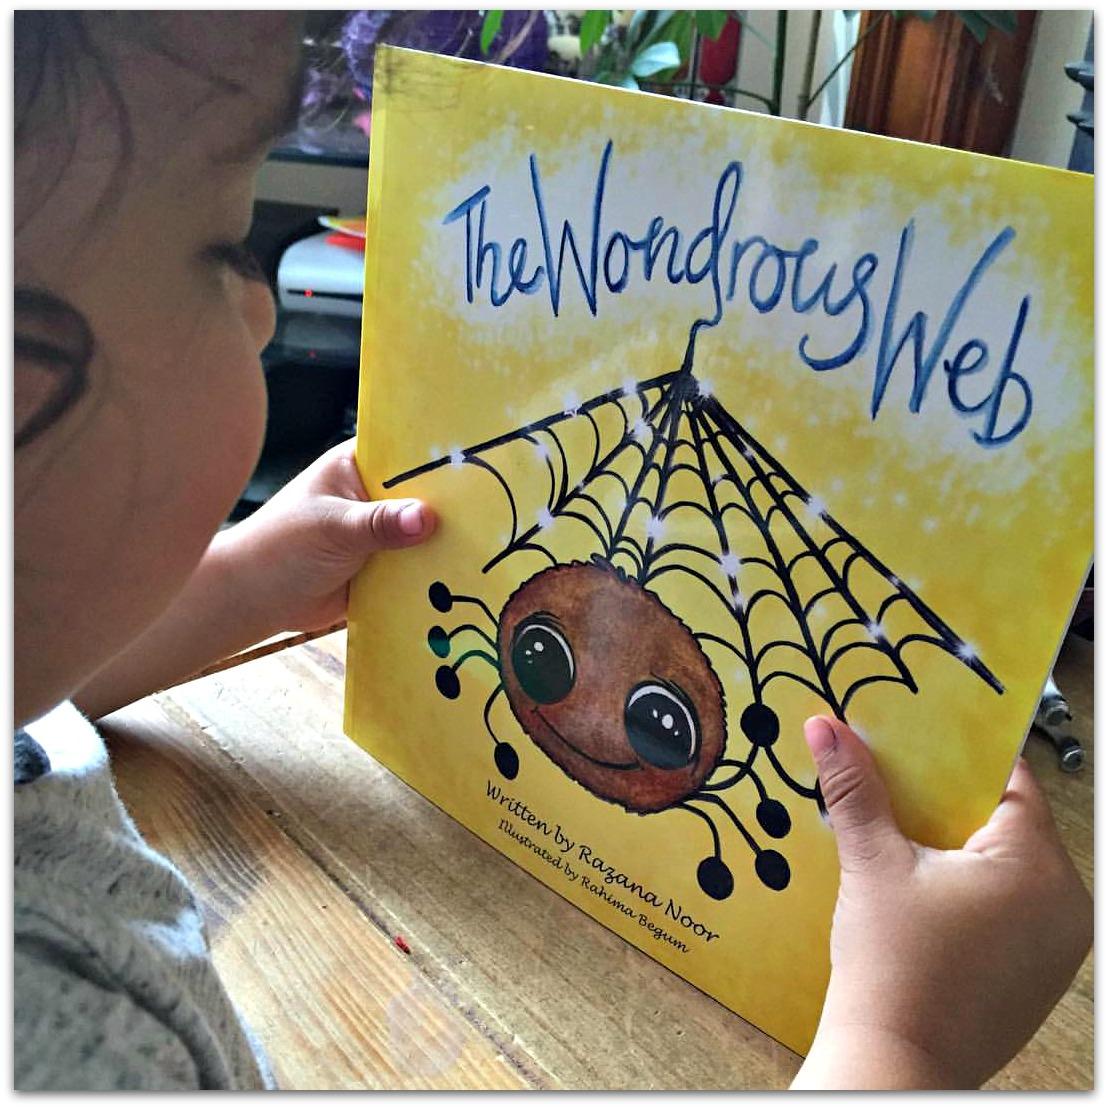 Reading the Wondrous web